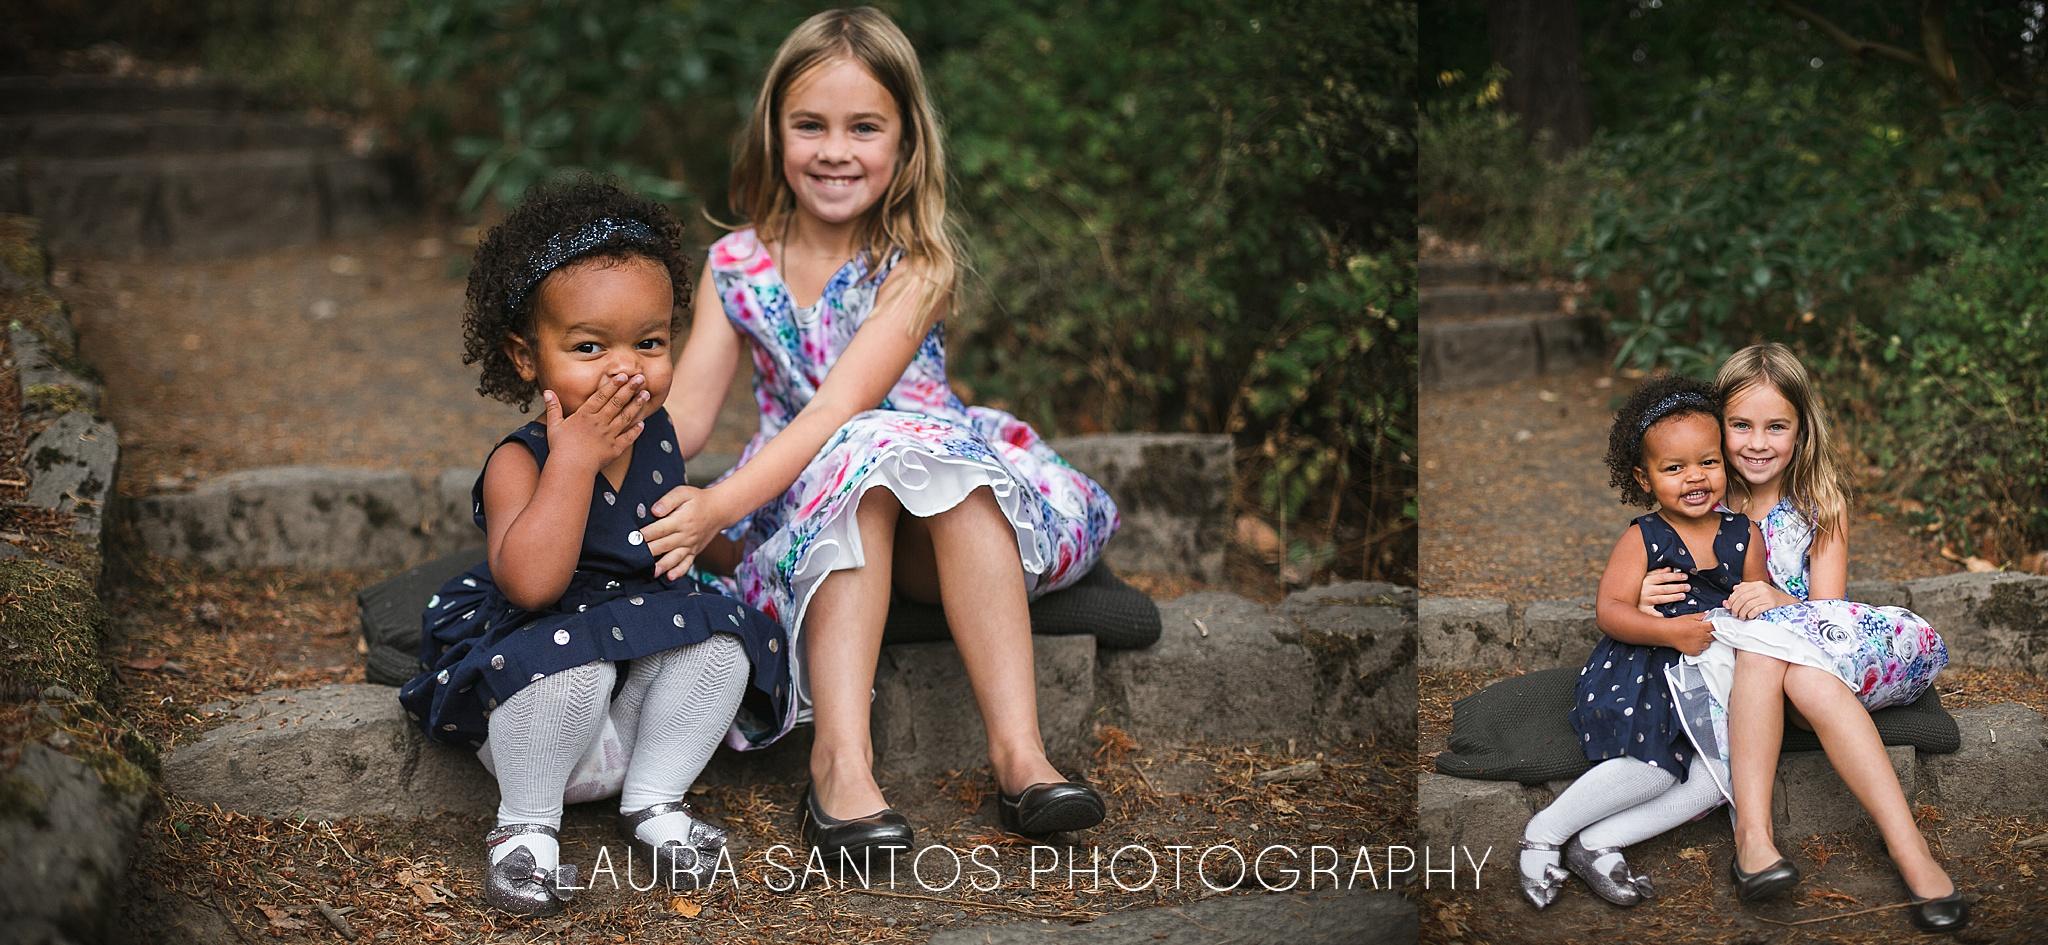 Laura Santos Photography Portland Oregon Family Photographer_0697.jpg